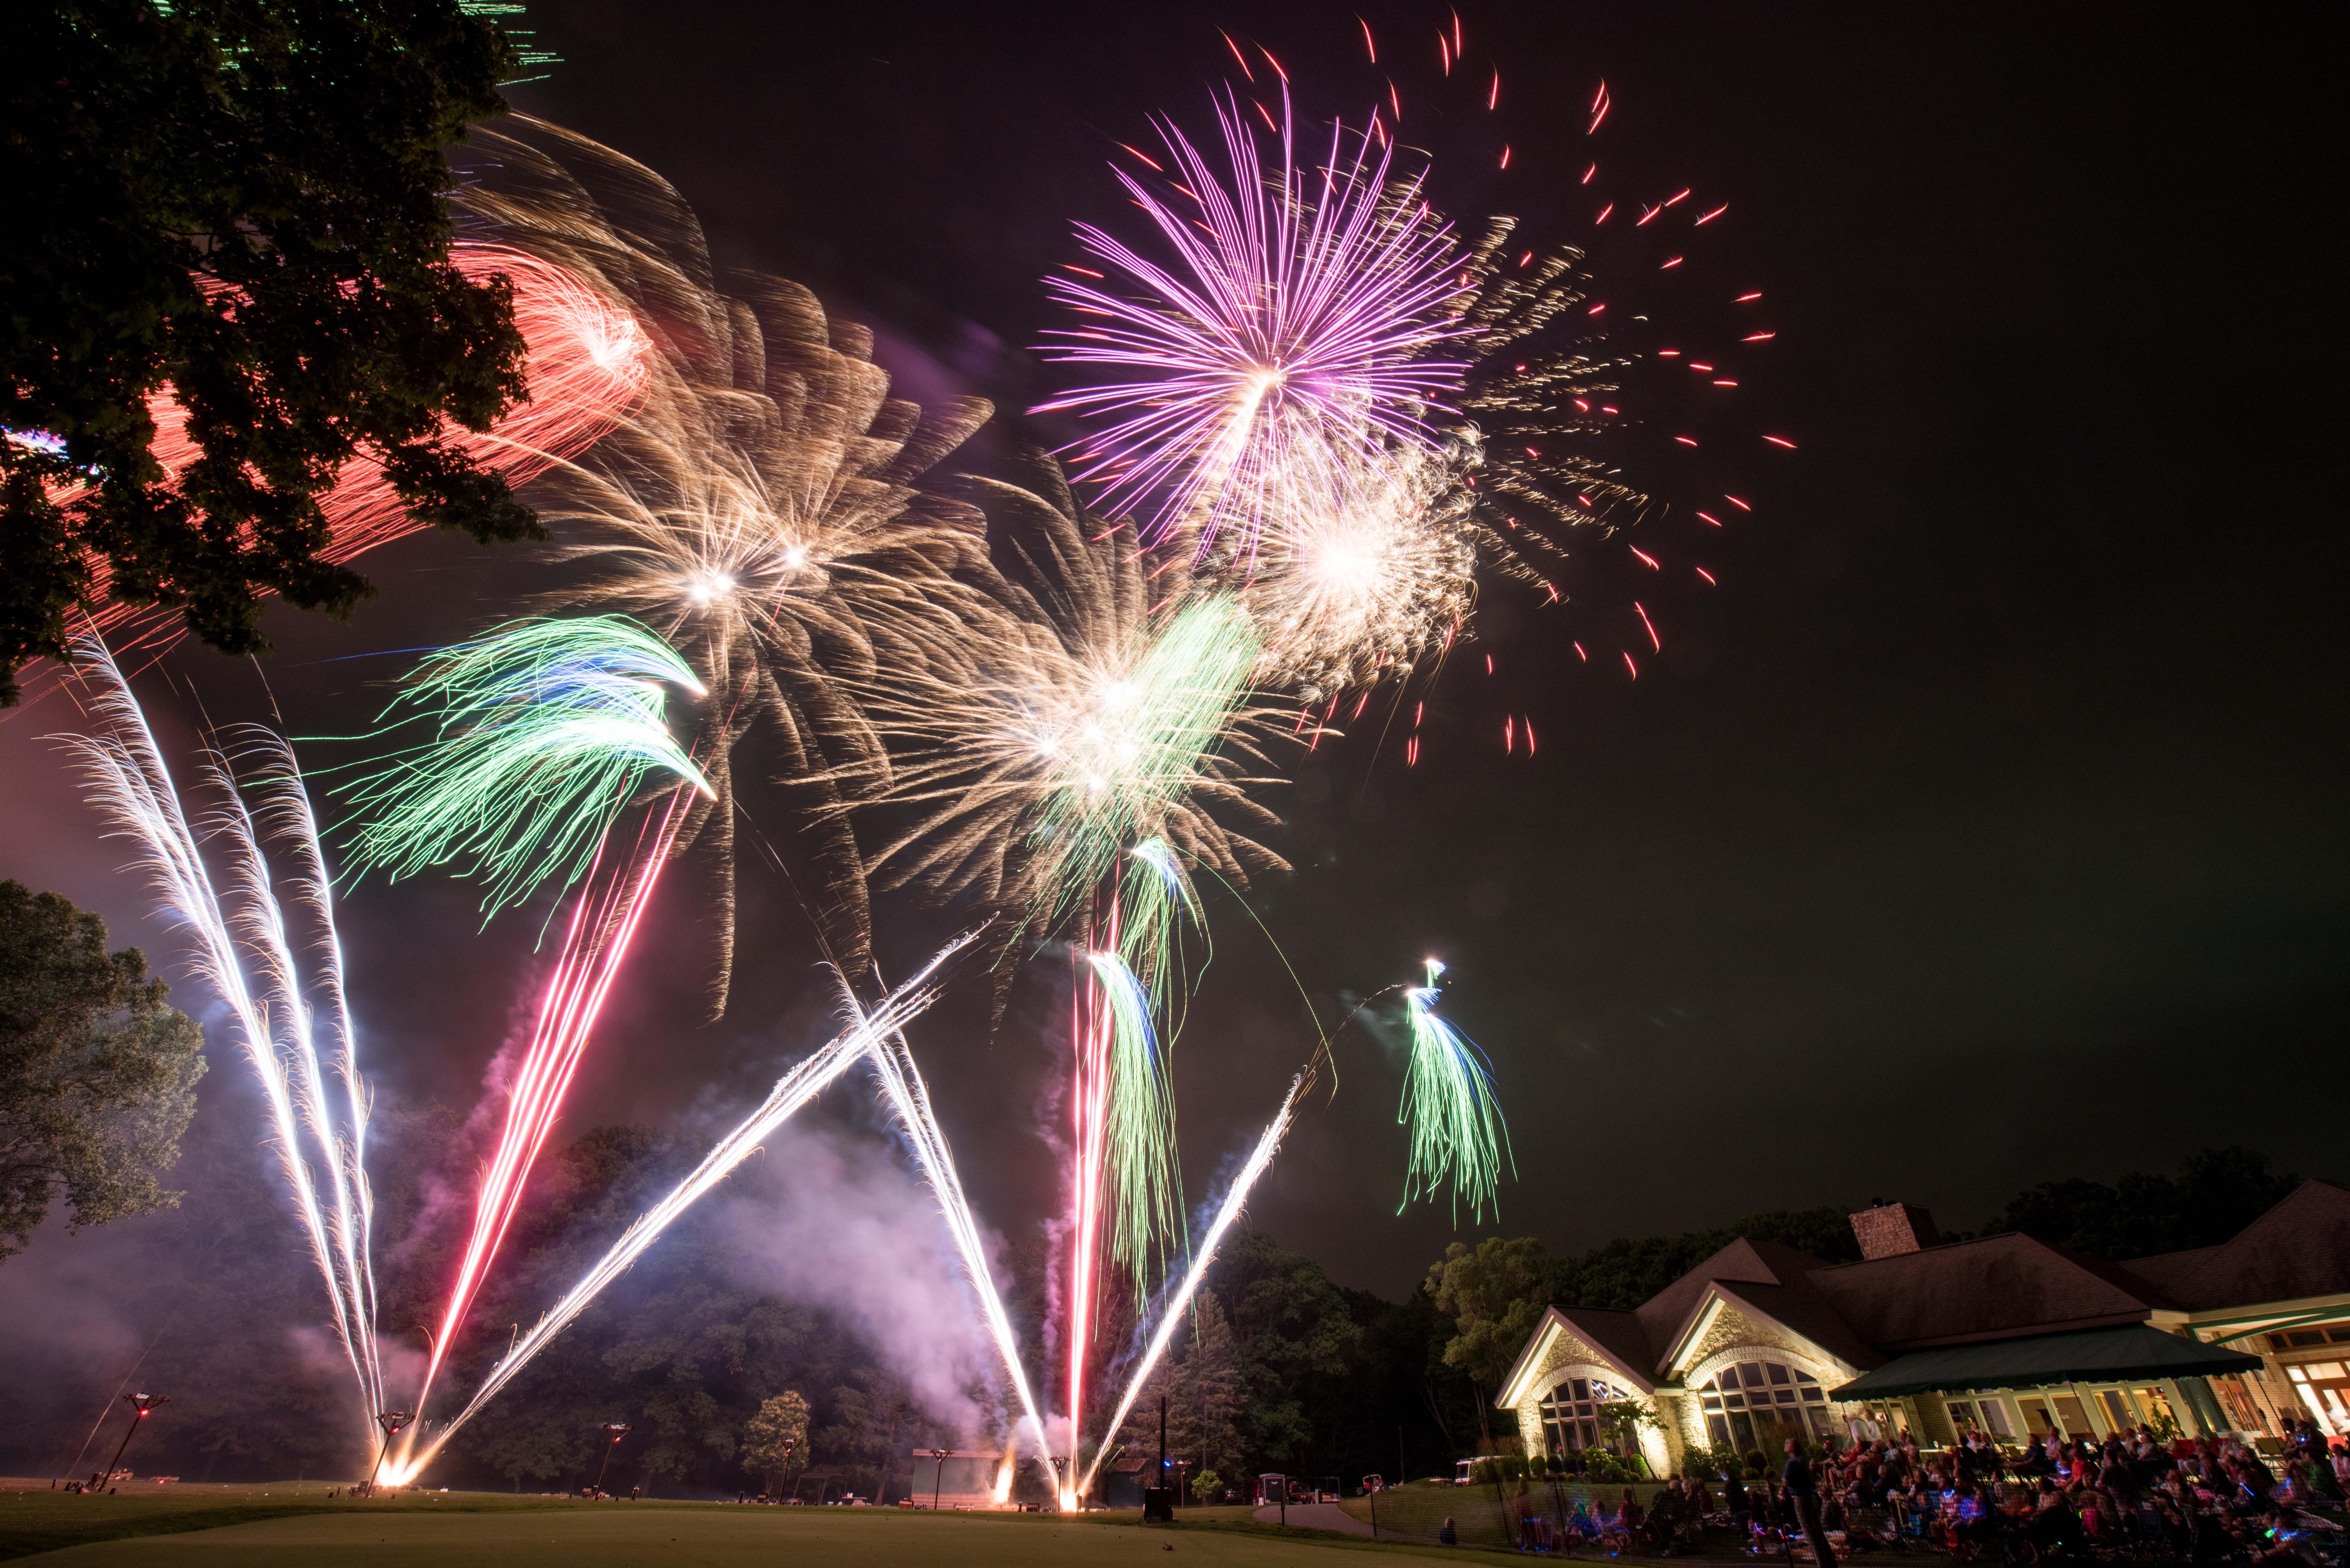 http://www.lakeshorecountryclub.com/uploads/slides/358695_lake-shore-fireworks.jpg